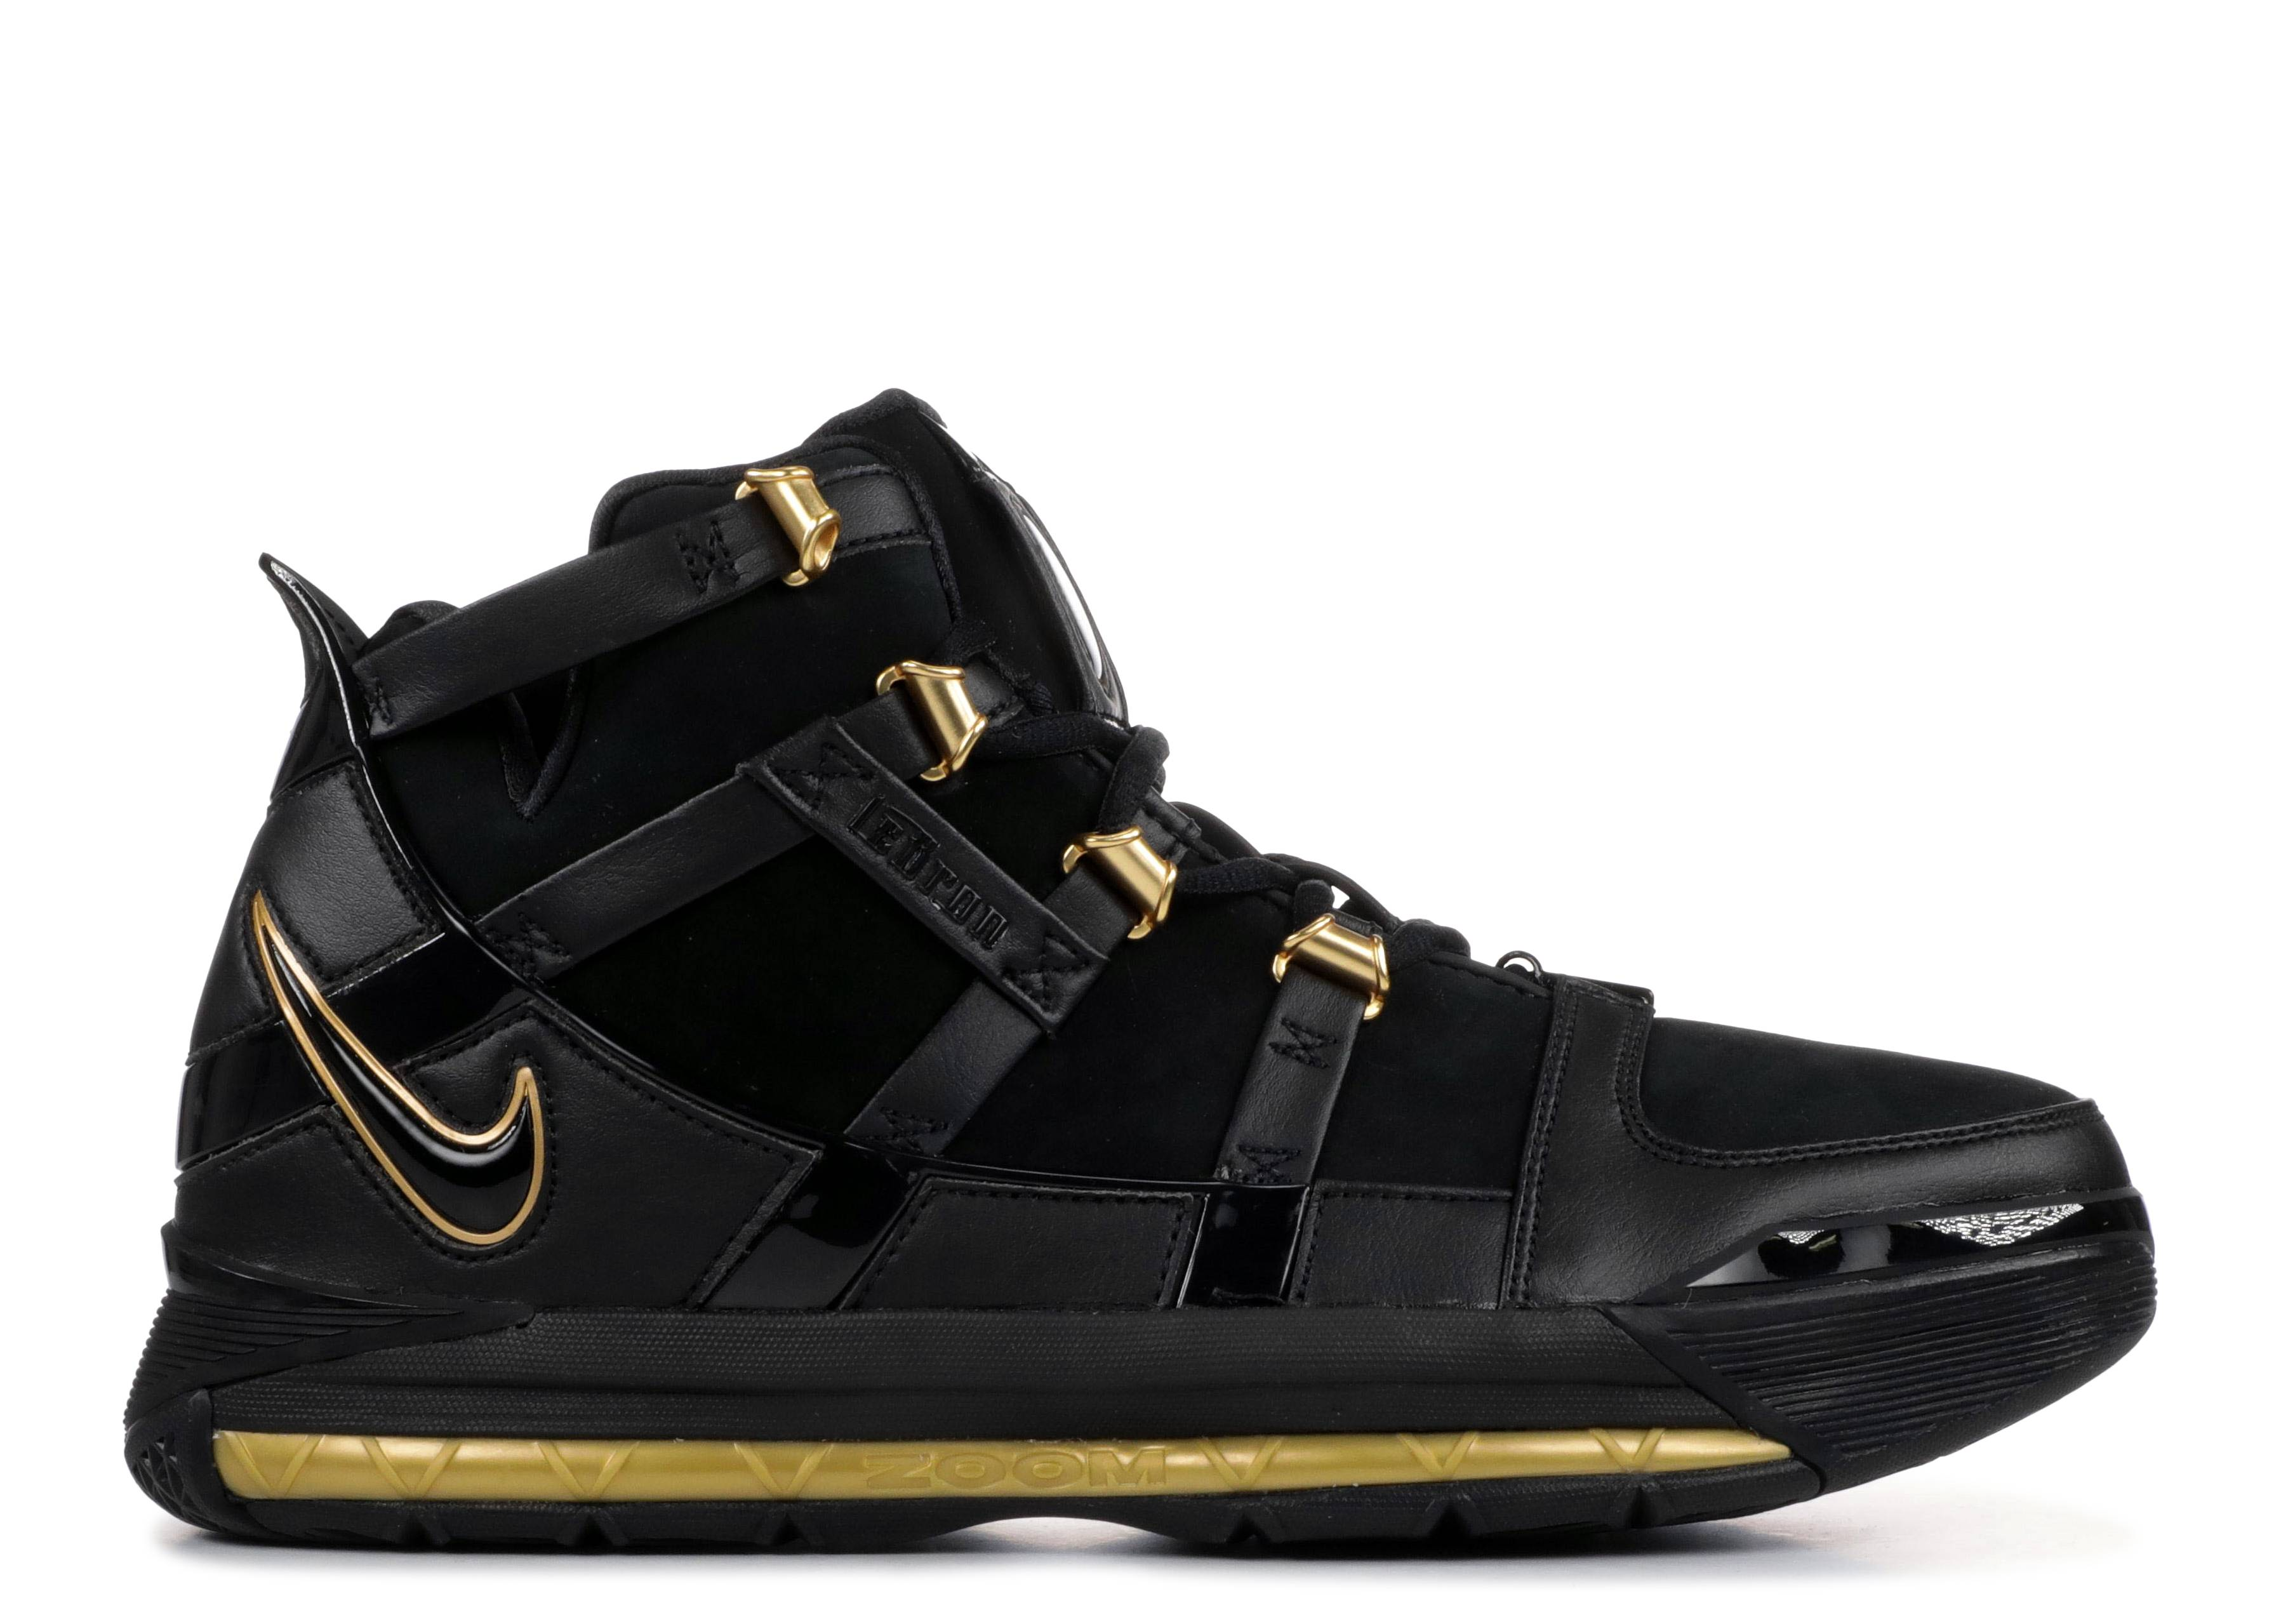 cc73855d1180a Zoom Lebron 3 Qs - Nike - ao2434 001 - black black-metallic gold ...